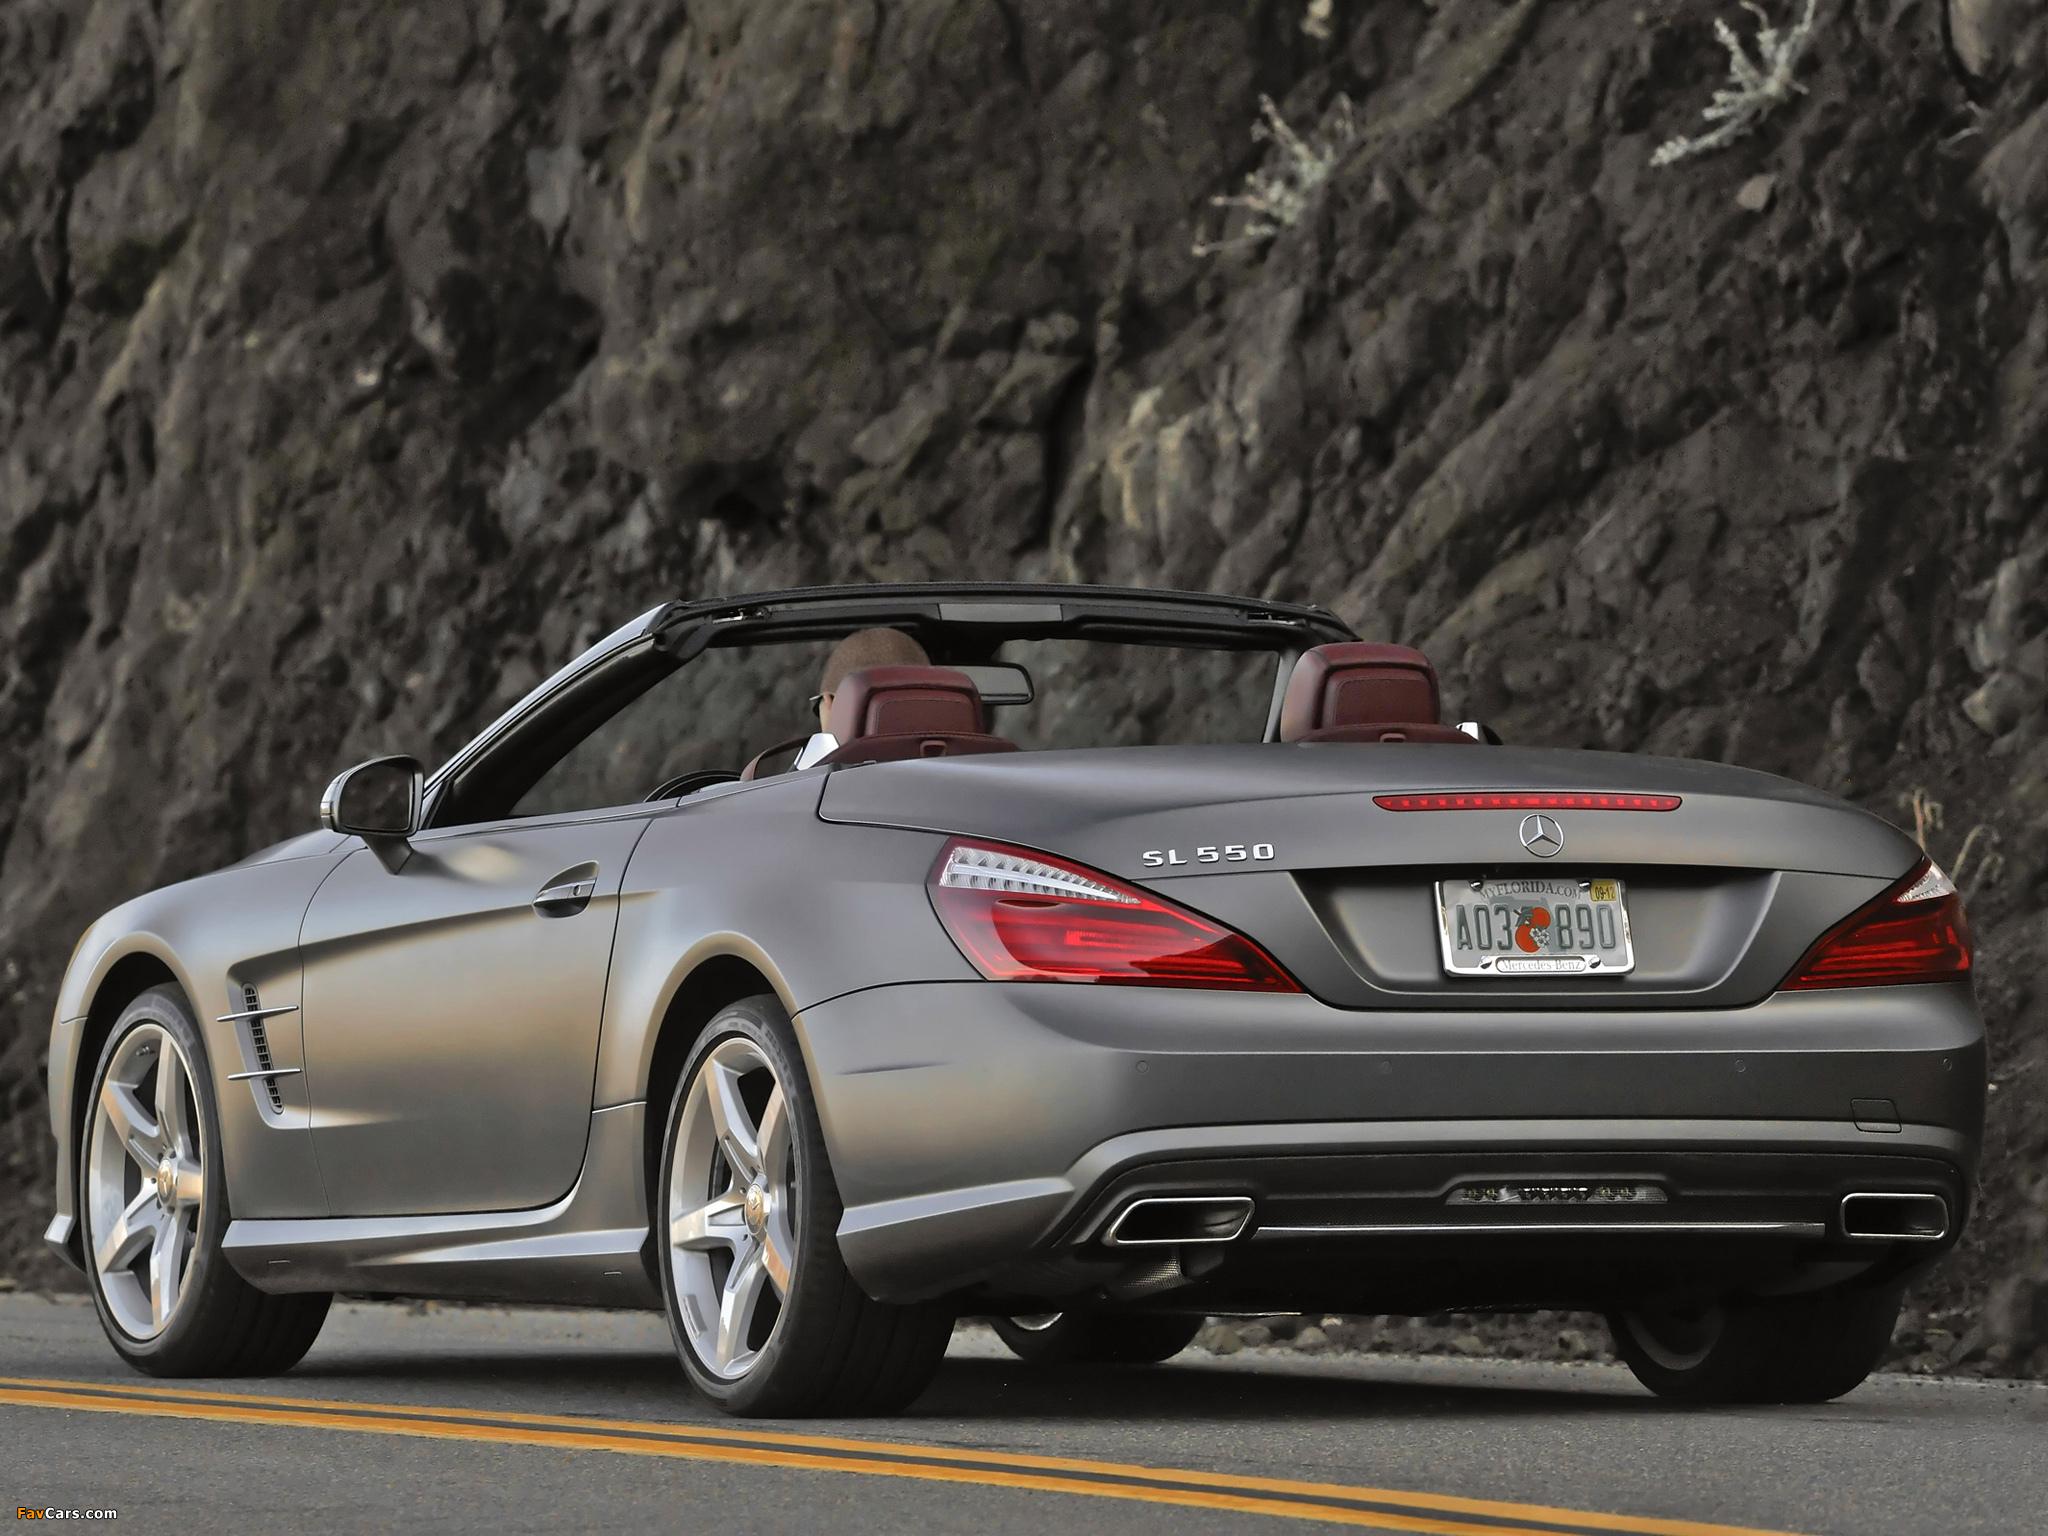 Mercedes-Benz SL 550 AMG Sports Package (R231) 2012 photos (2048 x 1536)